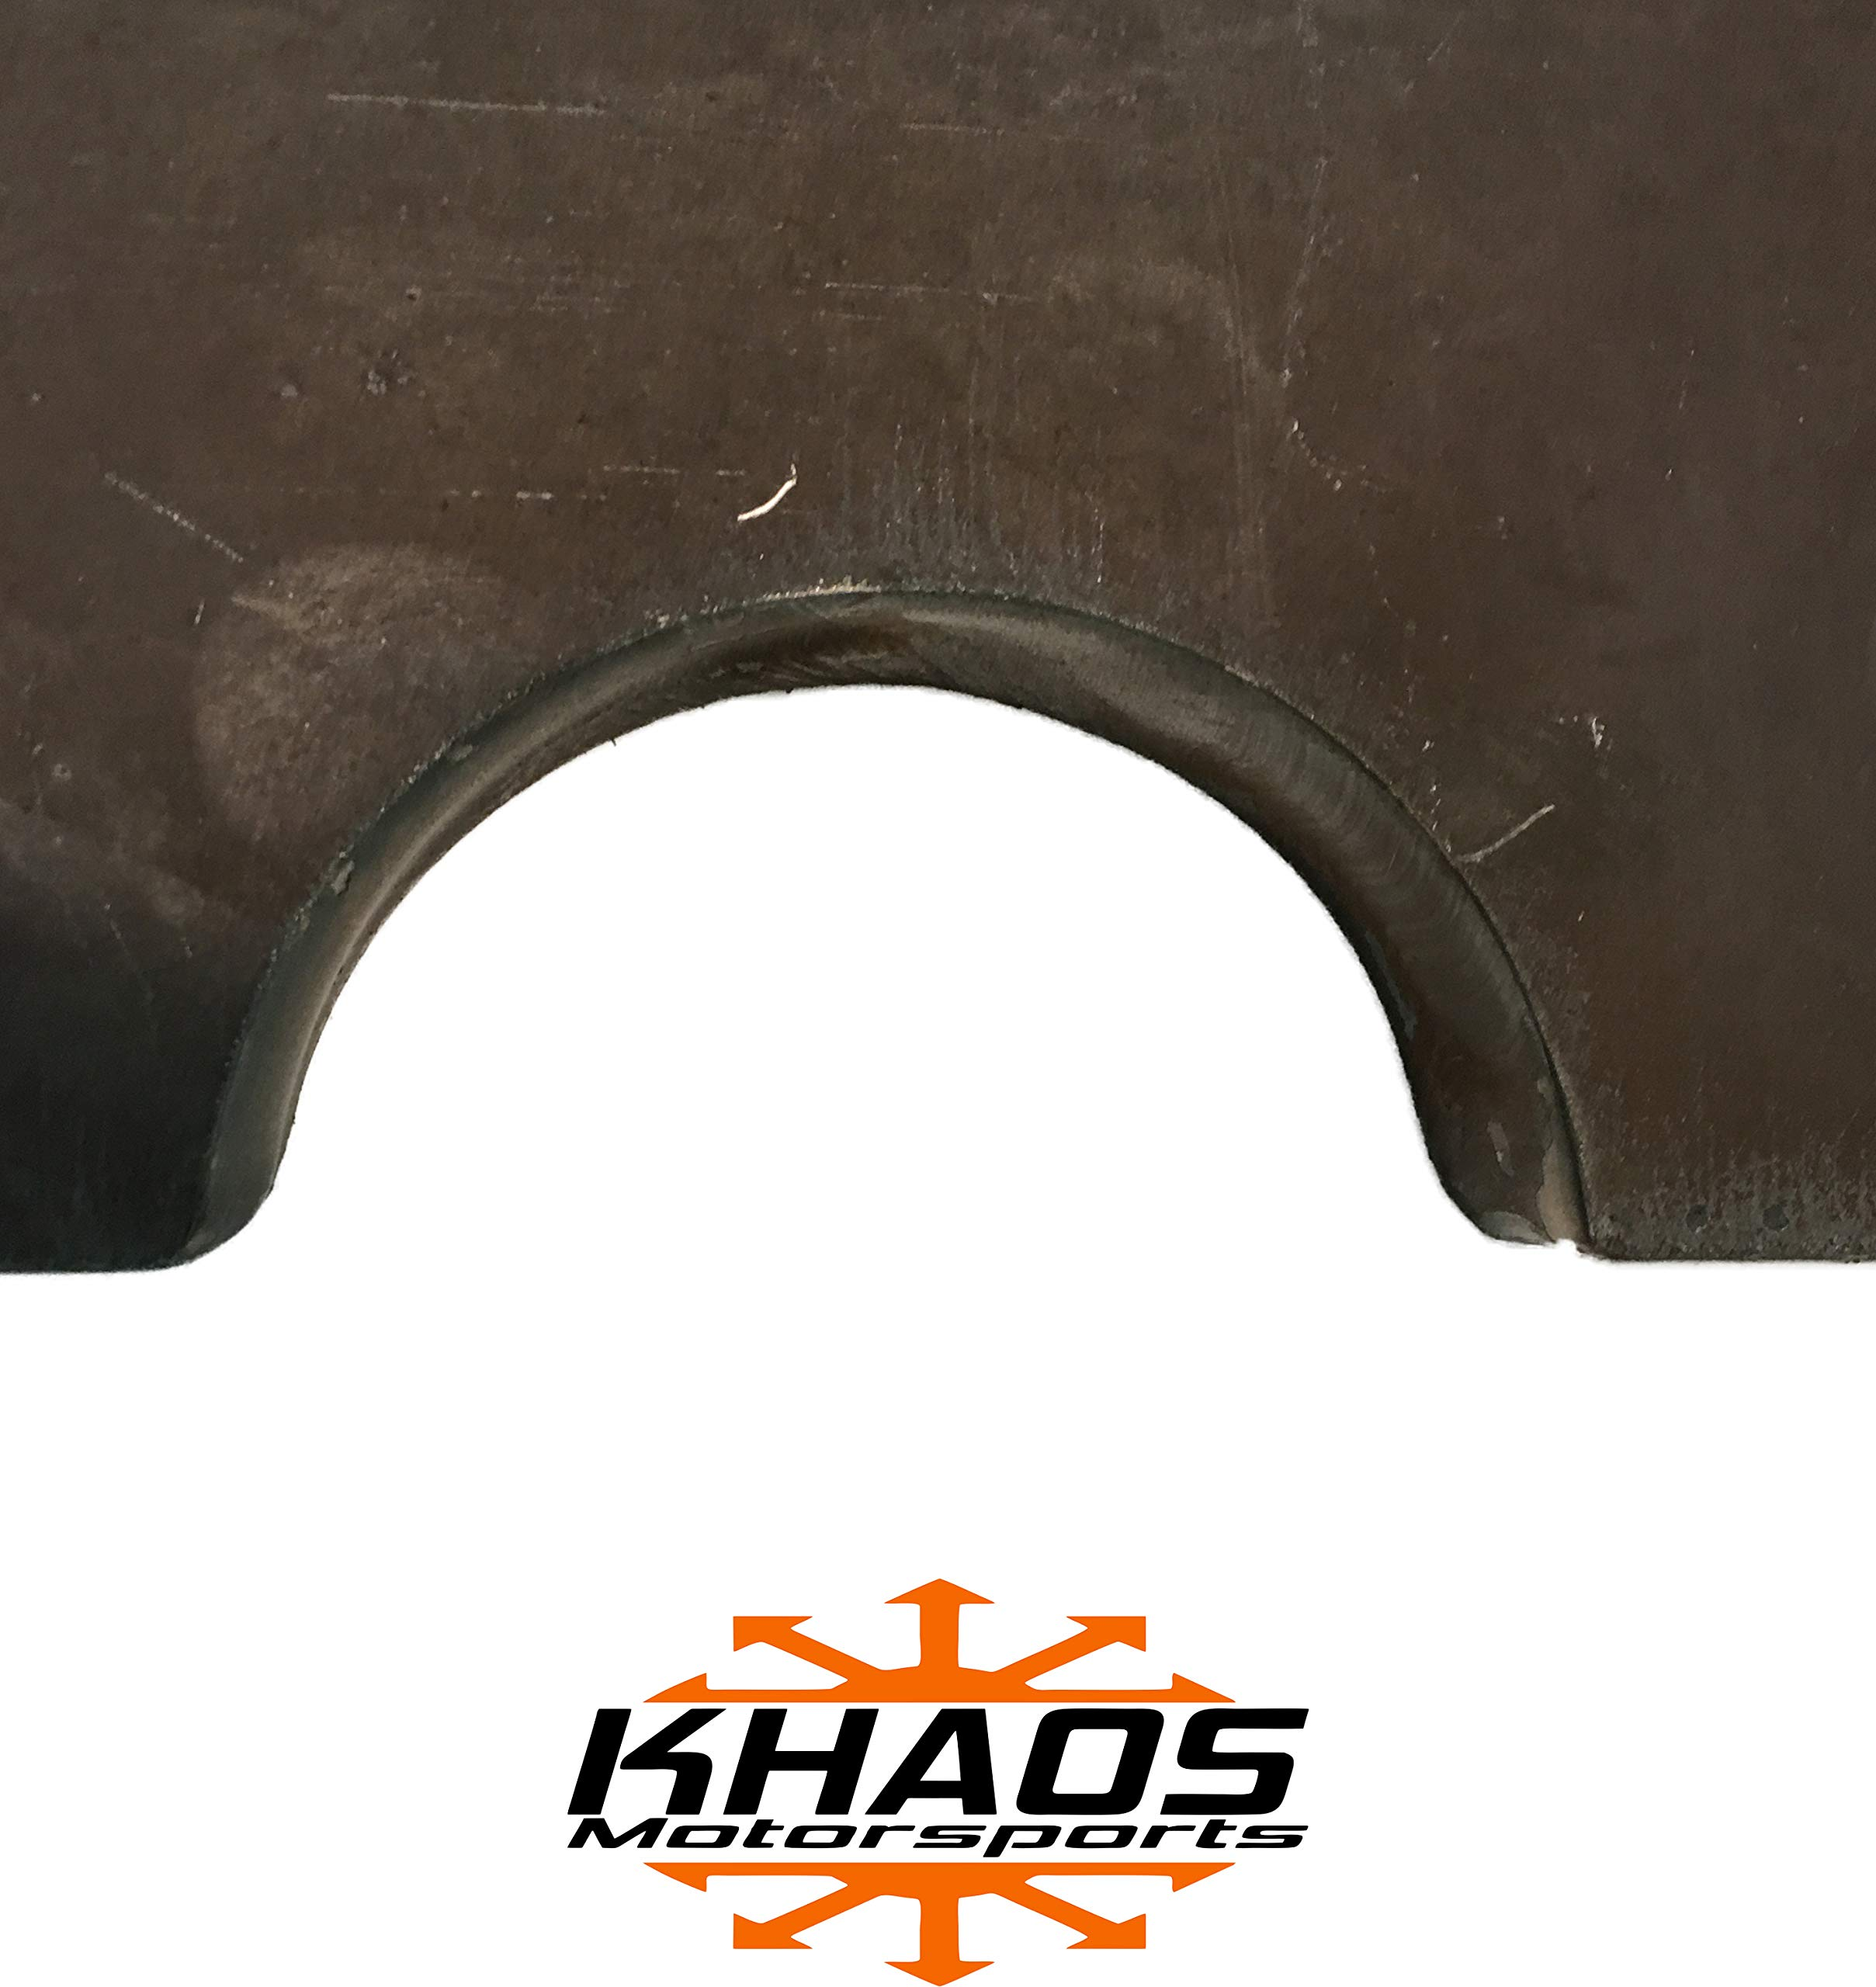 PRESS PLATES ARBOR PARALLELS 1''X8''X8'' SET by Khaos Motorsports (Image #5)